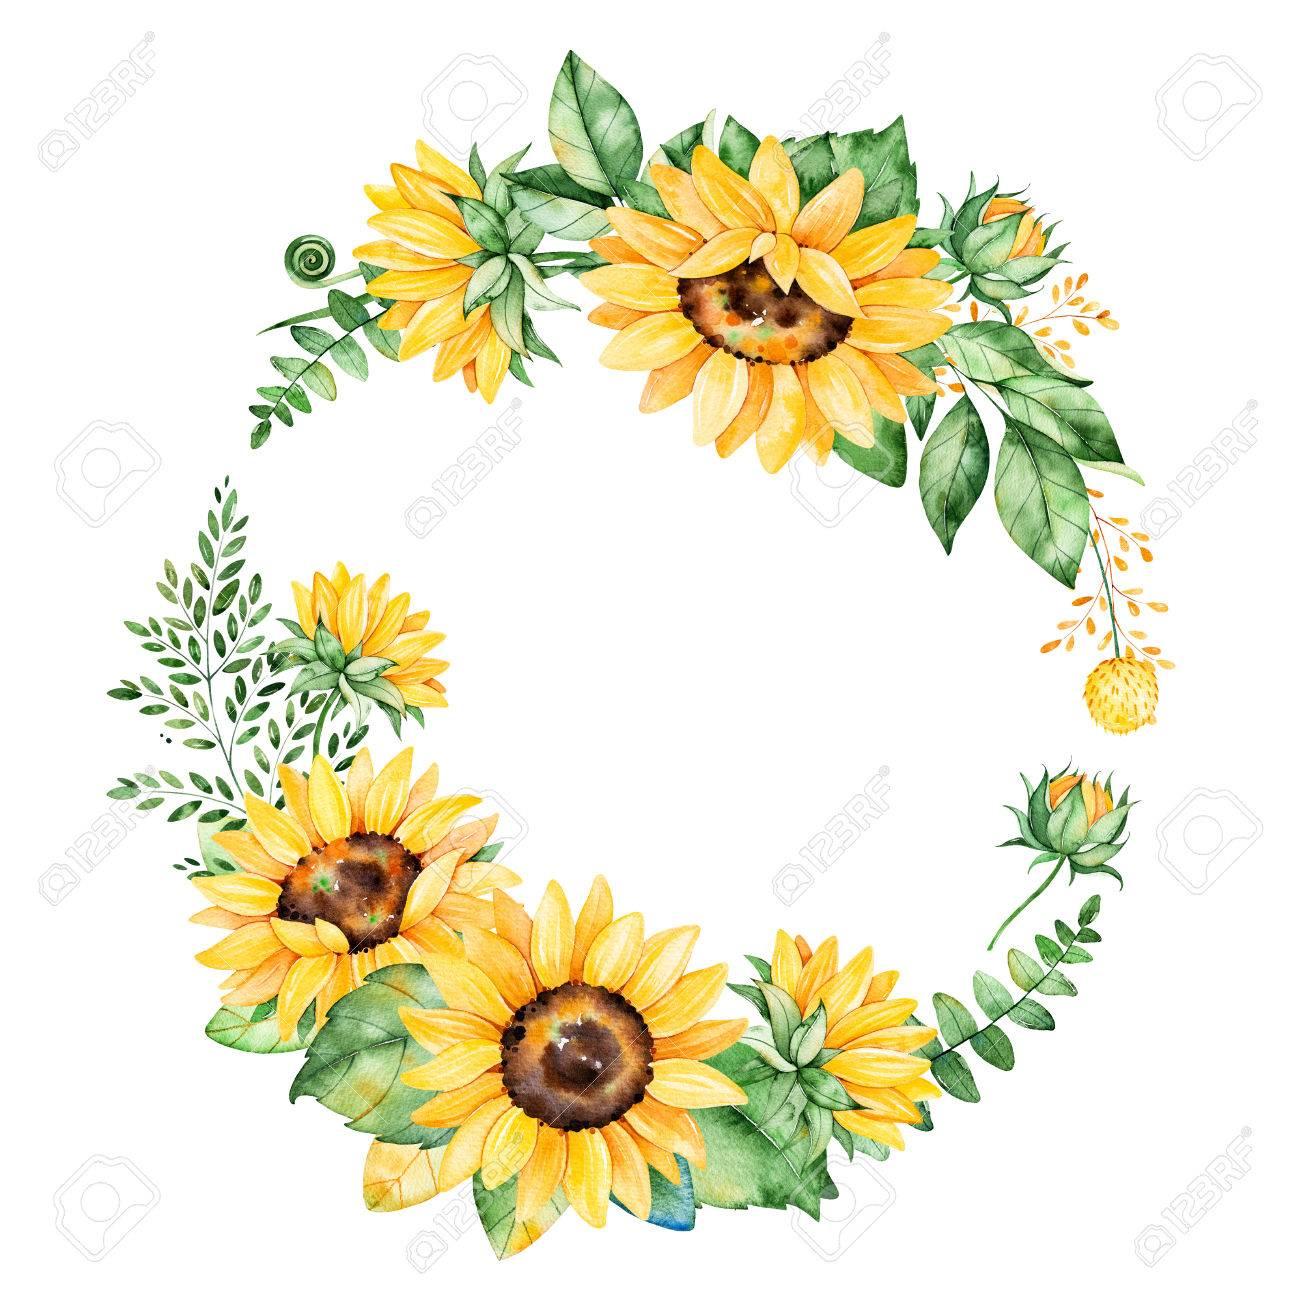 Fantastisch Sonnenblumen Malblatt Fotos - Entry Level Resume ...